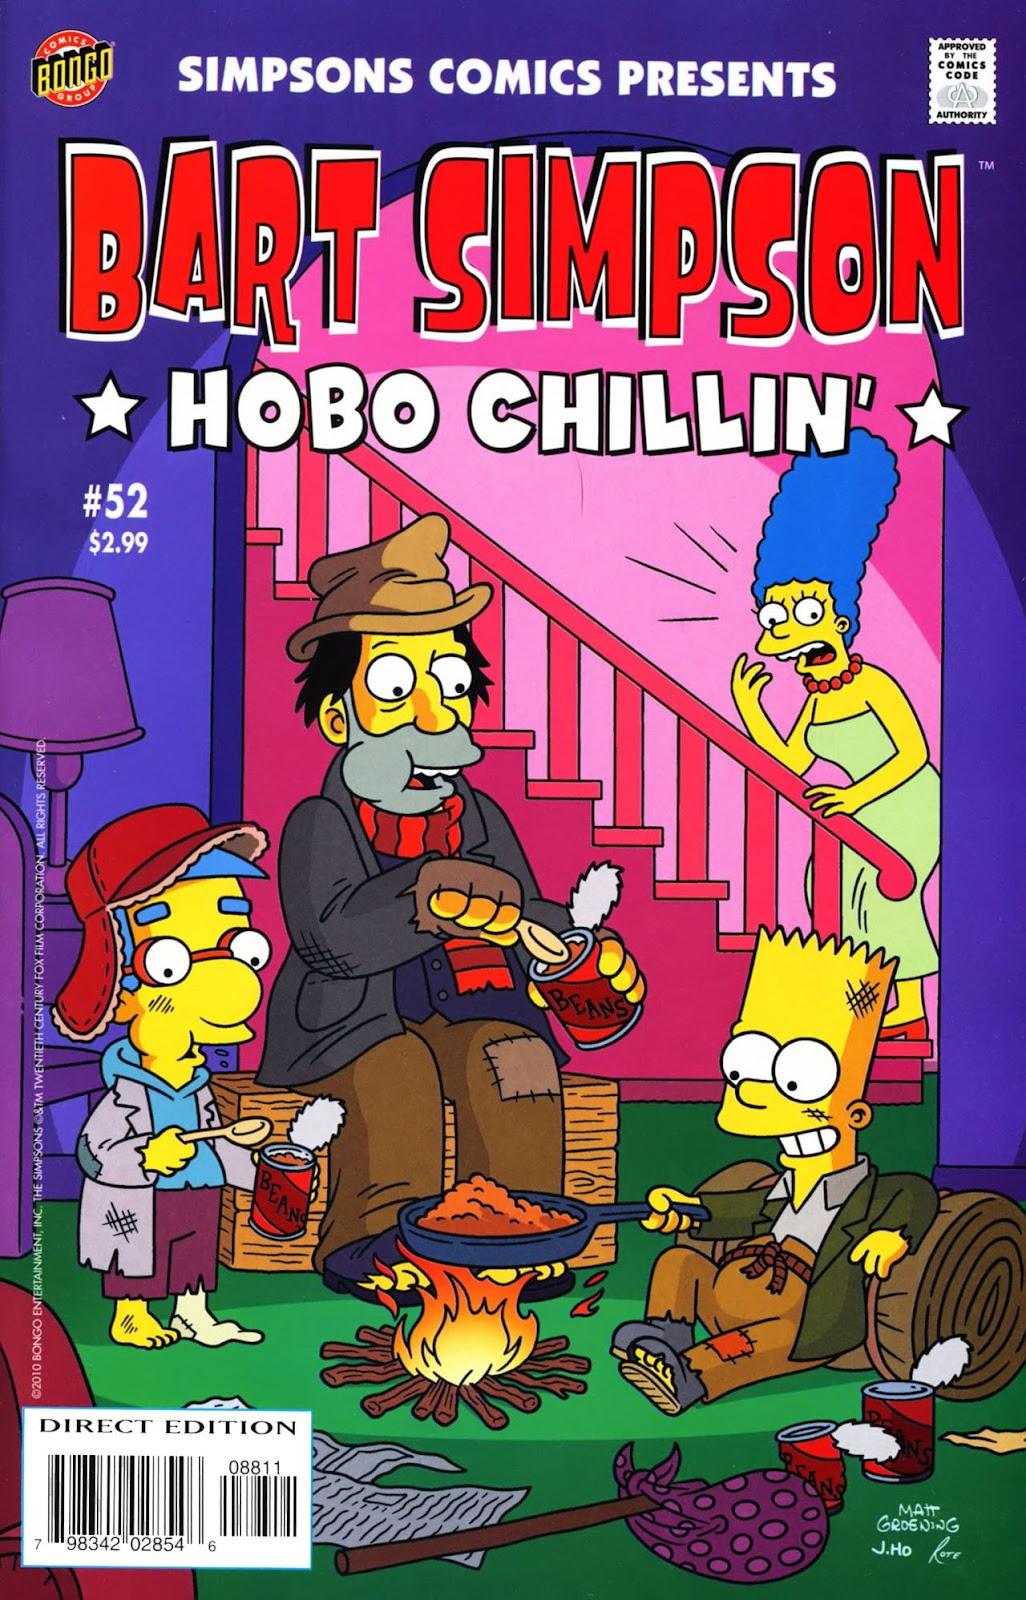 Simpsons Comics Presents Bart Simpson 52 Page 1